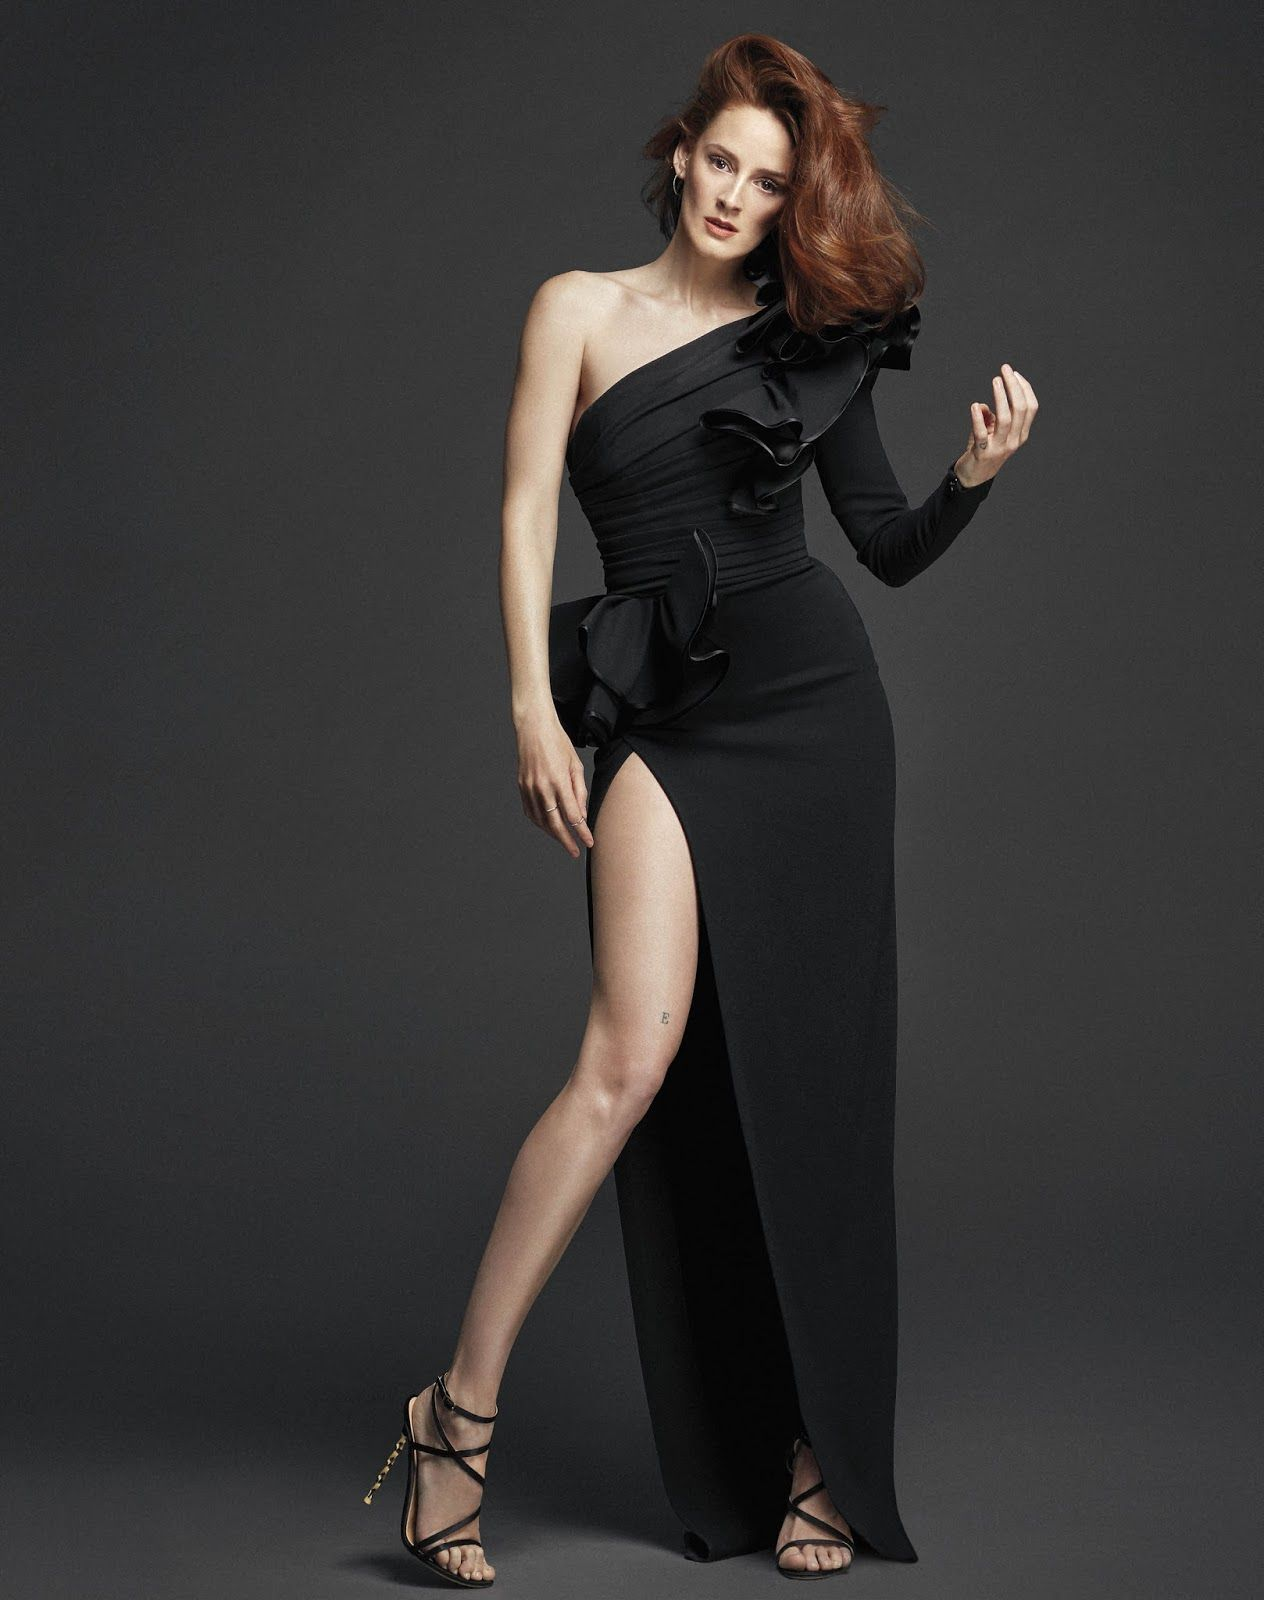 Ana Maria Polvorosa Color Negro Desnudos